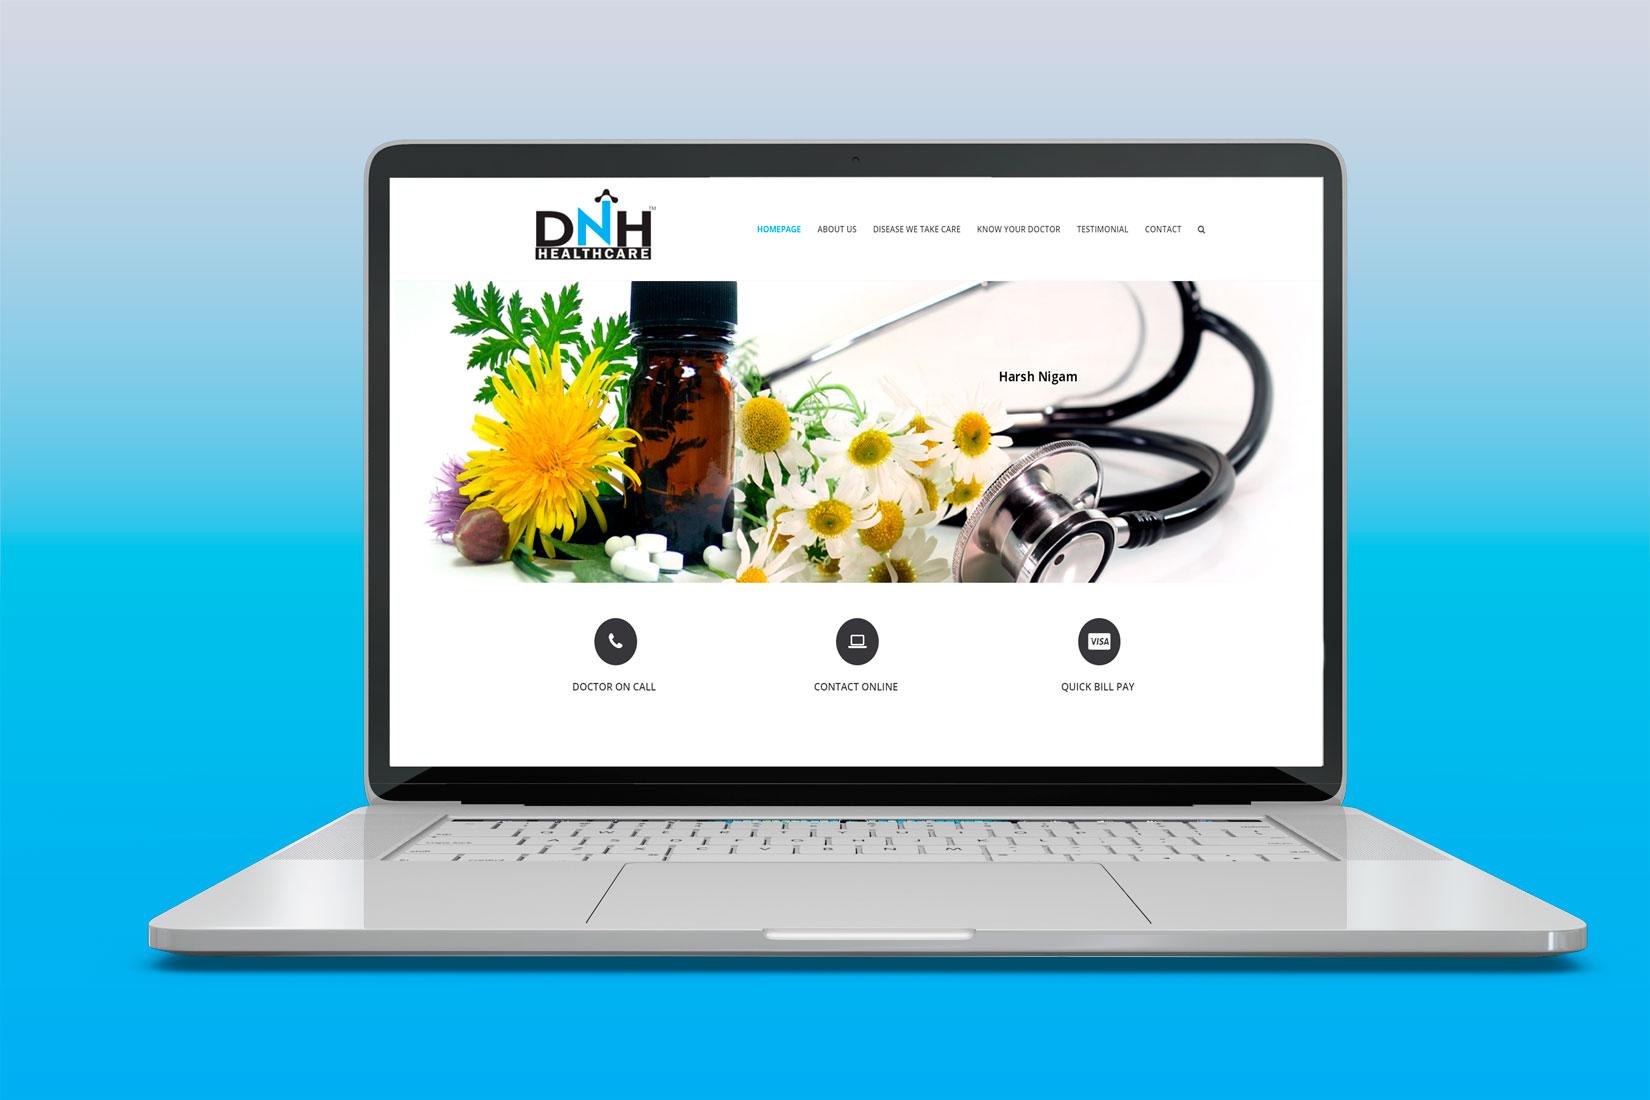 DNH healthcare